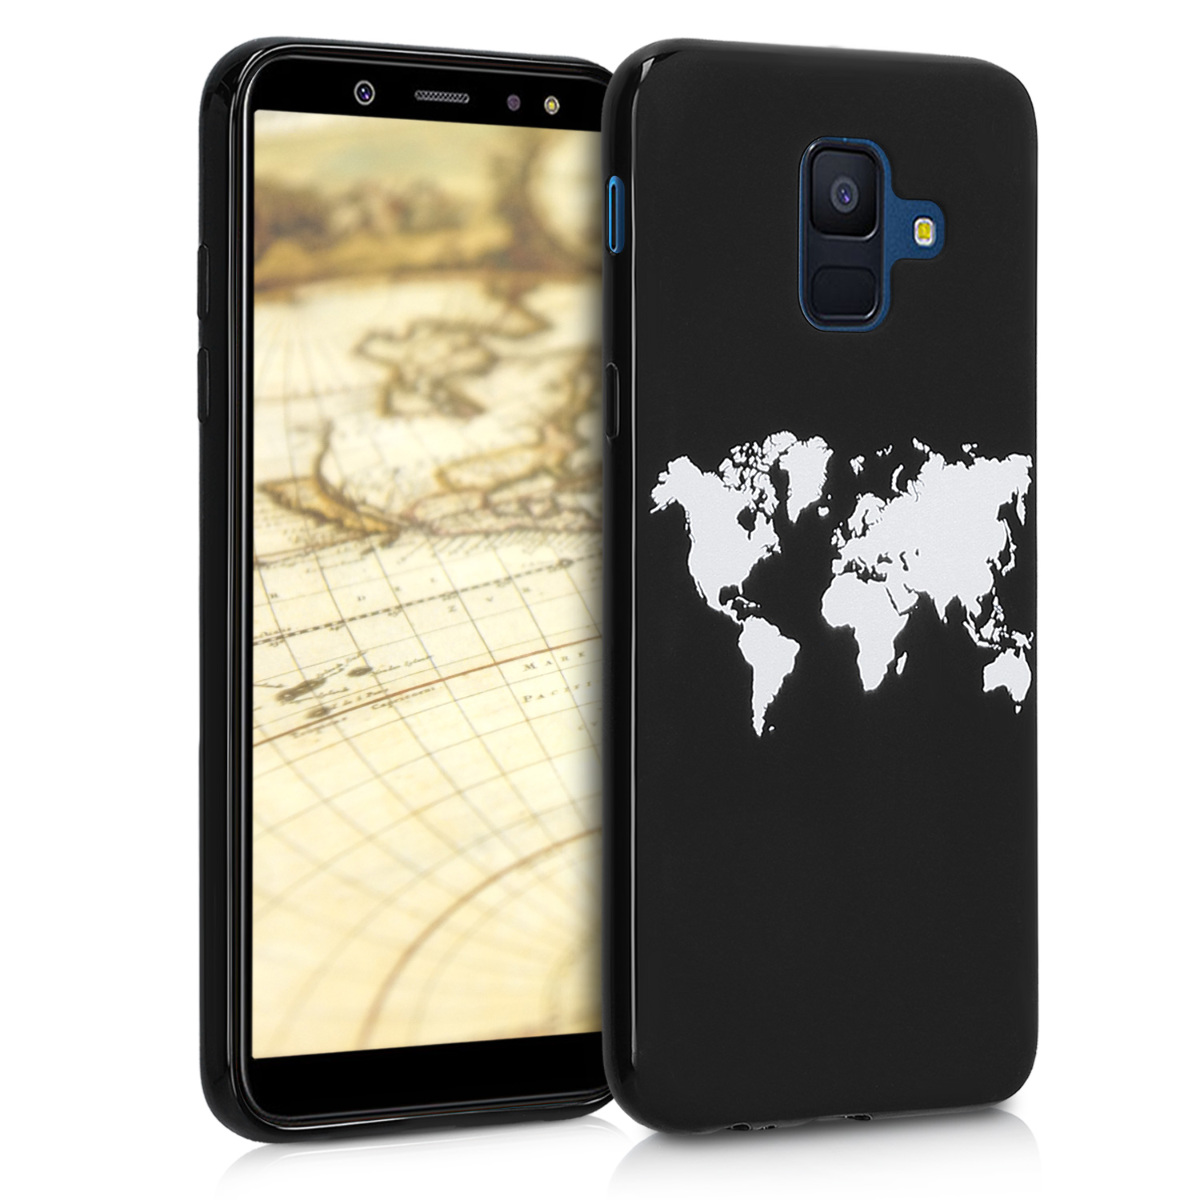 KW Θήκη Σιλικόνης Samsung Galaxy A6 (2018) - Soft Flexible Shock Absorbent - White / Black (46527.03)